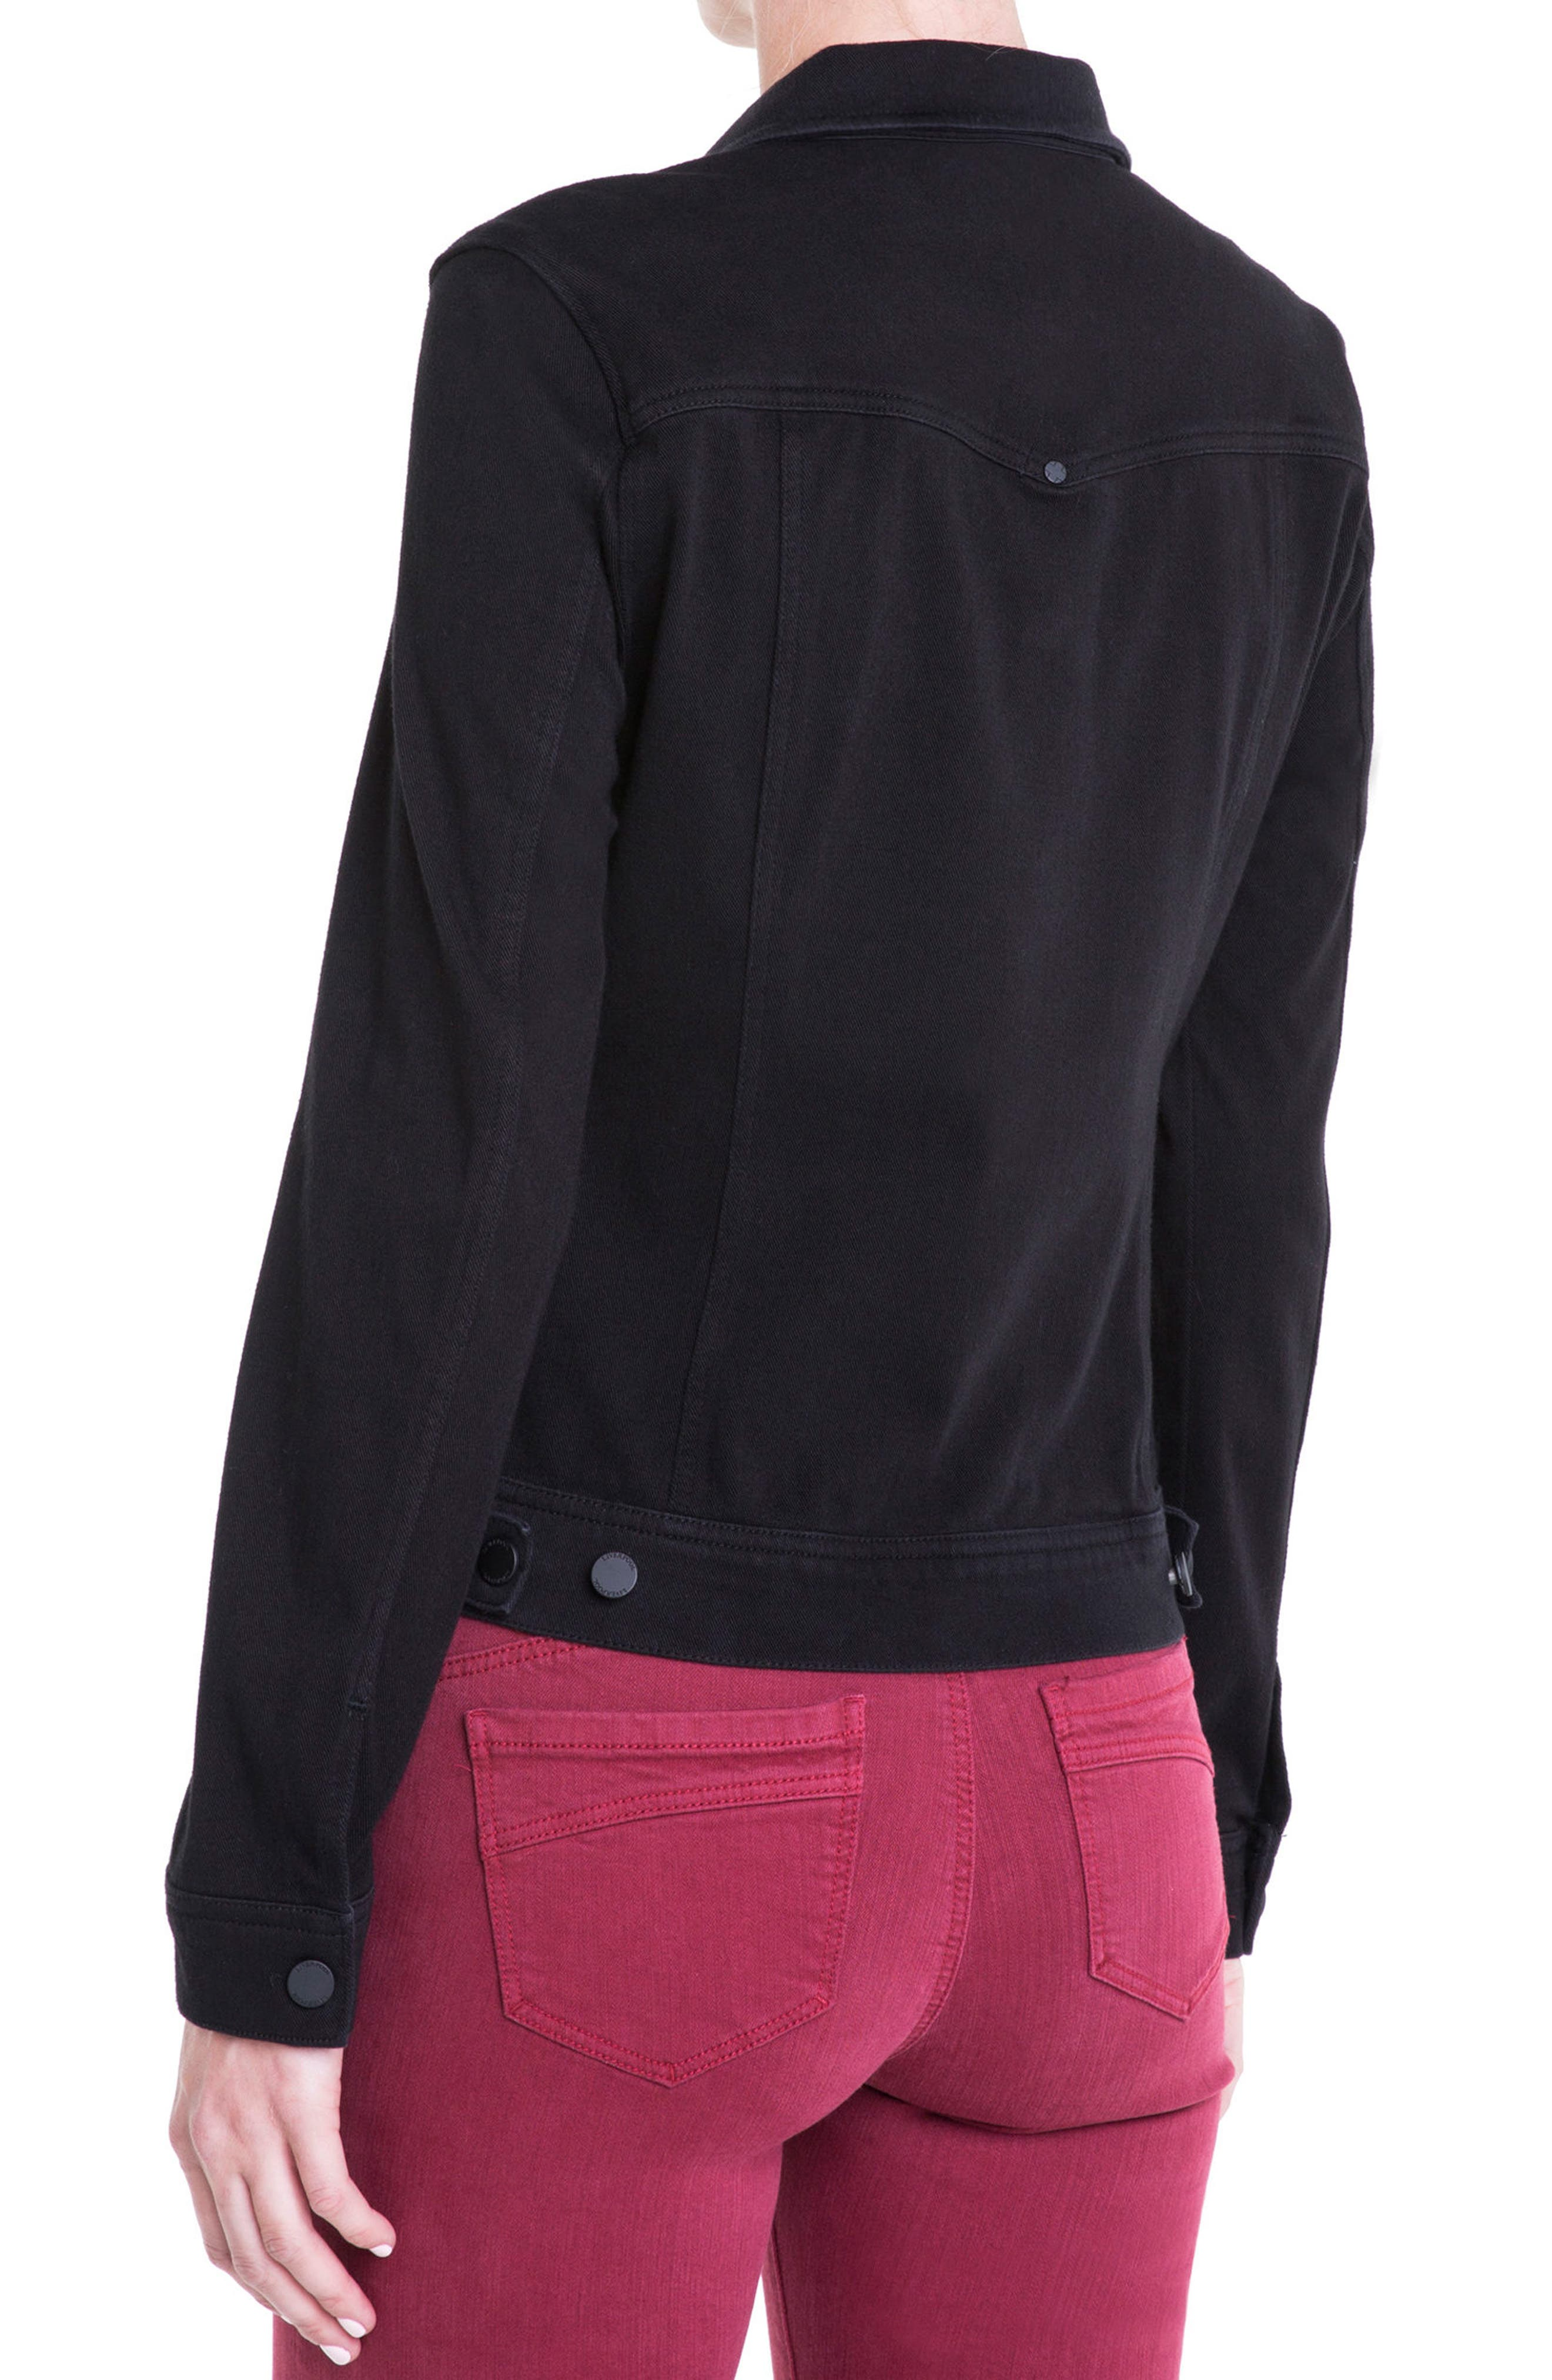 Alternate Image 4  - Liverpool Jeans Co. Knit Denim Jacket (Petite)